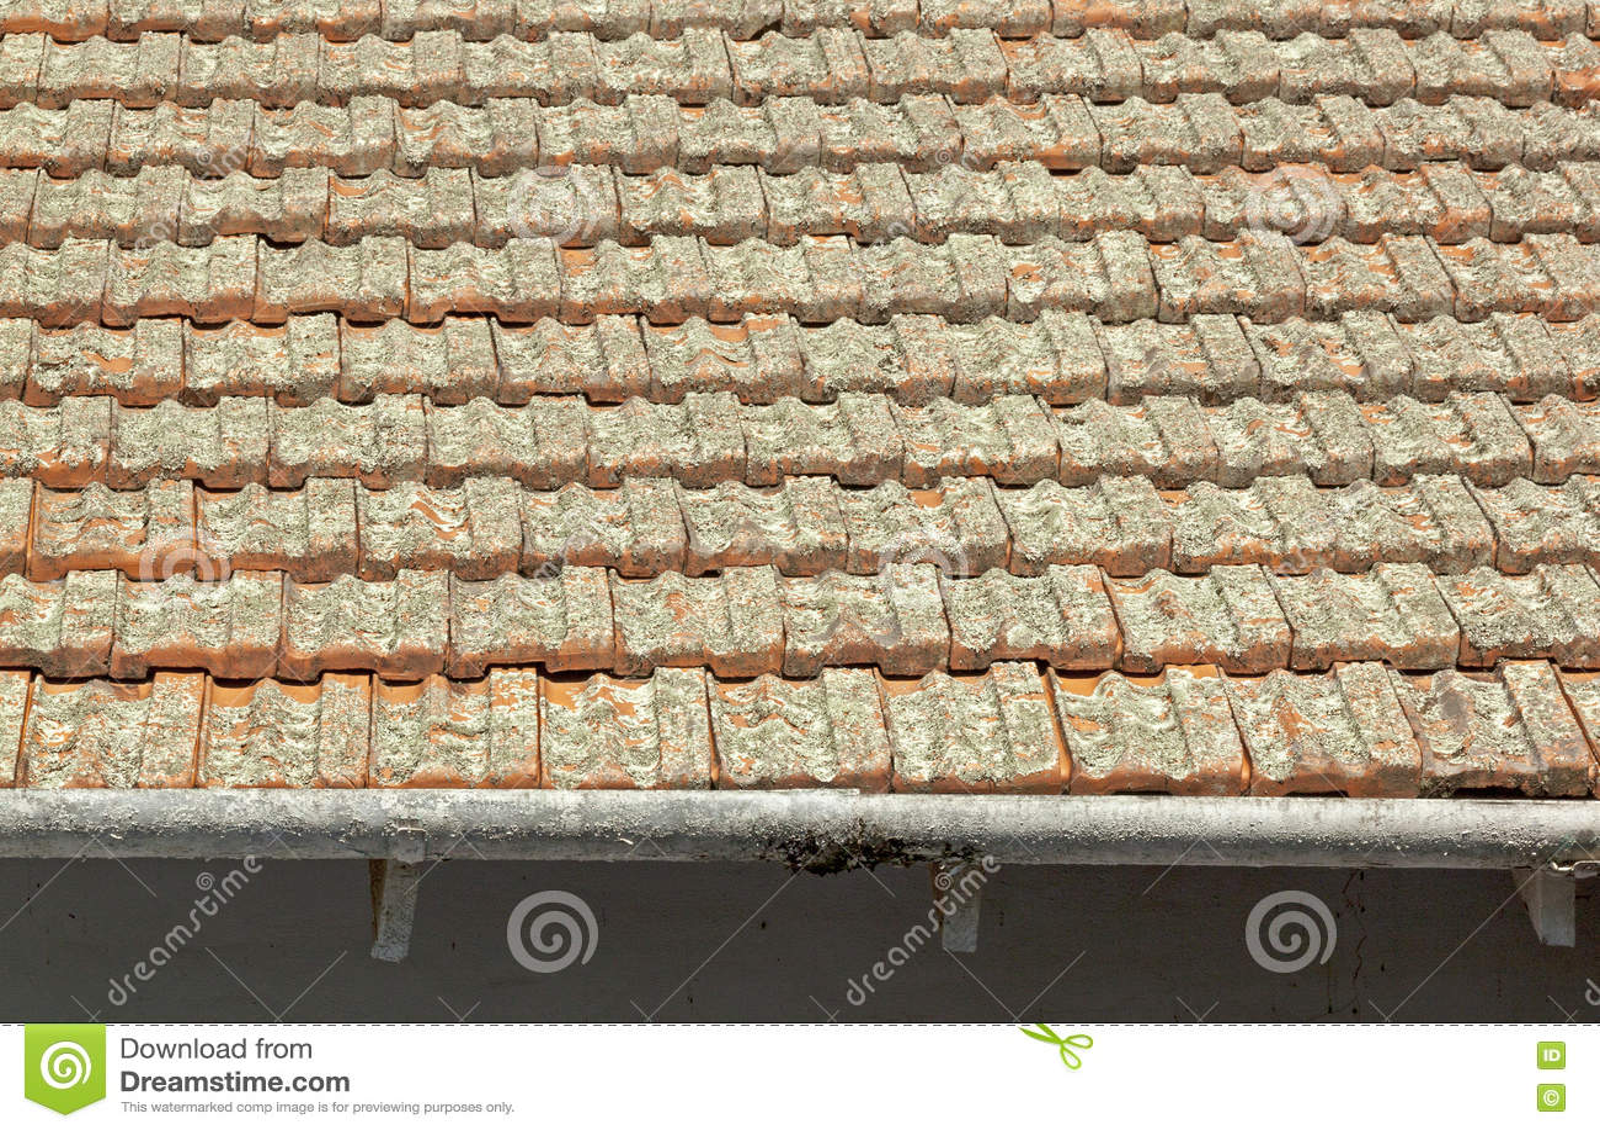 Clay Roof Tiles Covered in der Flechte mit Schalen-Gossen